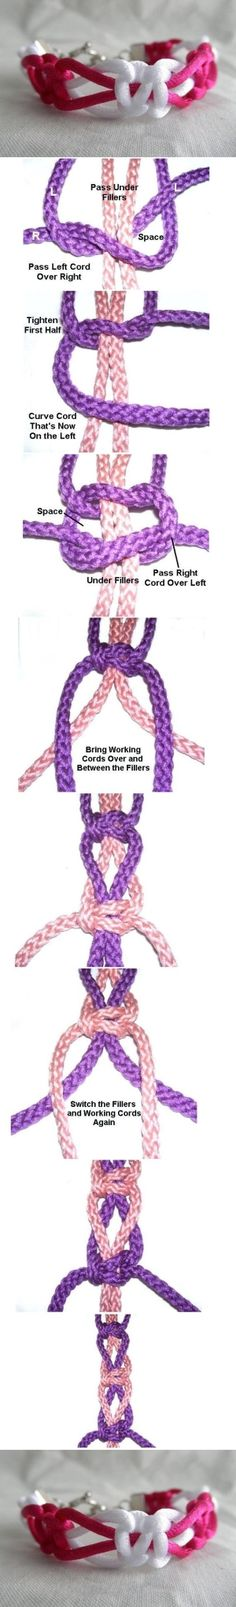 DIY Macrame Bracelet DIY Macrame Bracelet by diyforever